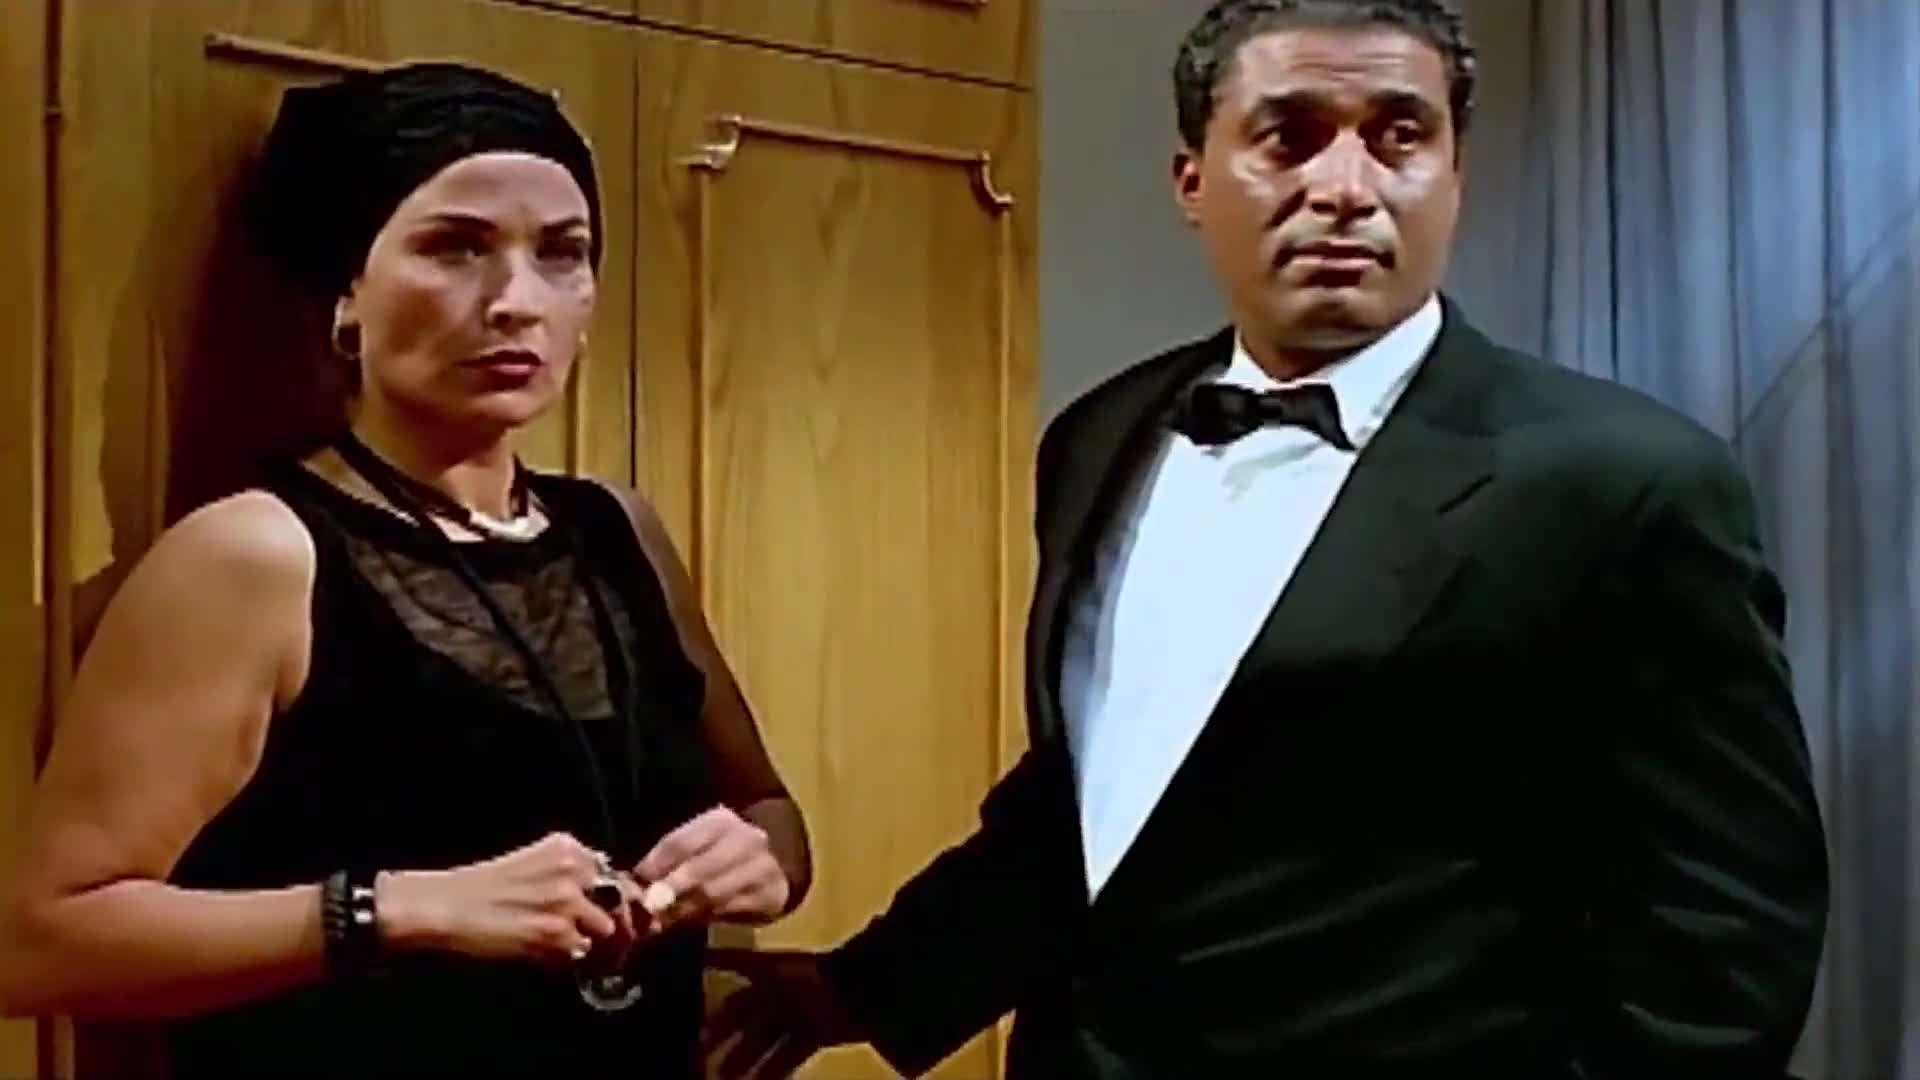 [فيلم][تورنت][تحميل][استاكوزا][1996][1080p][Web-DL] 13 arabp2p.com